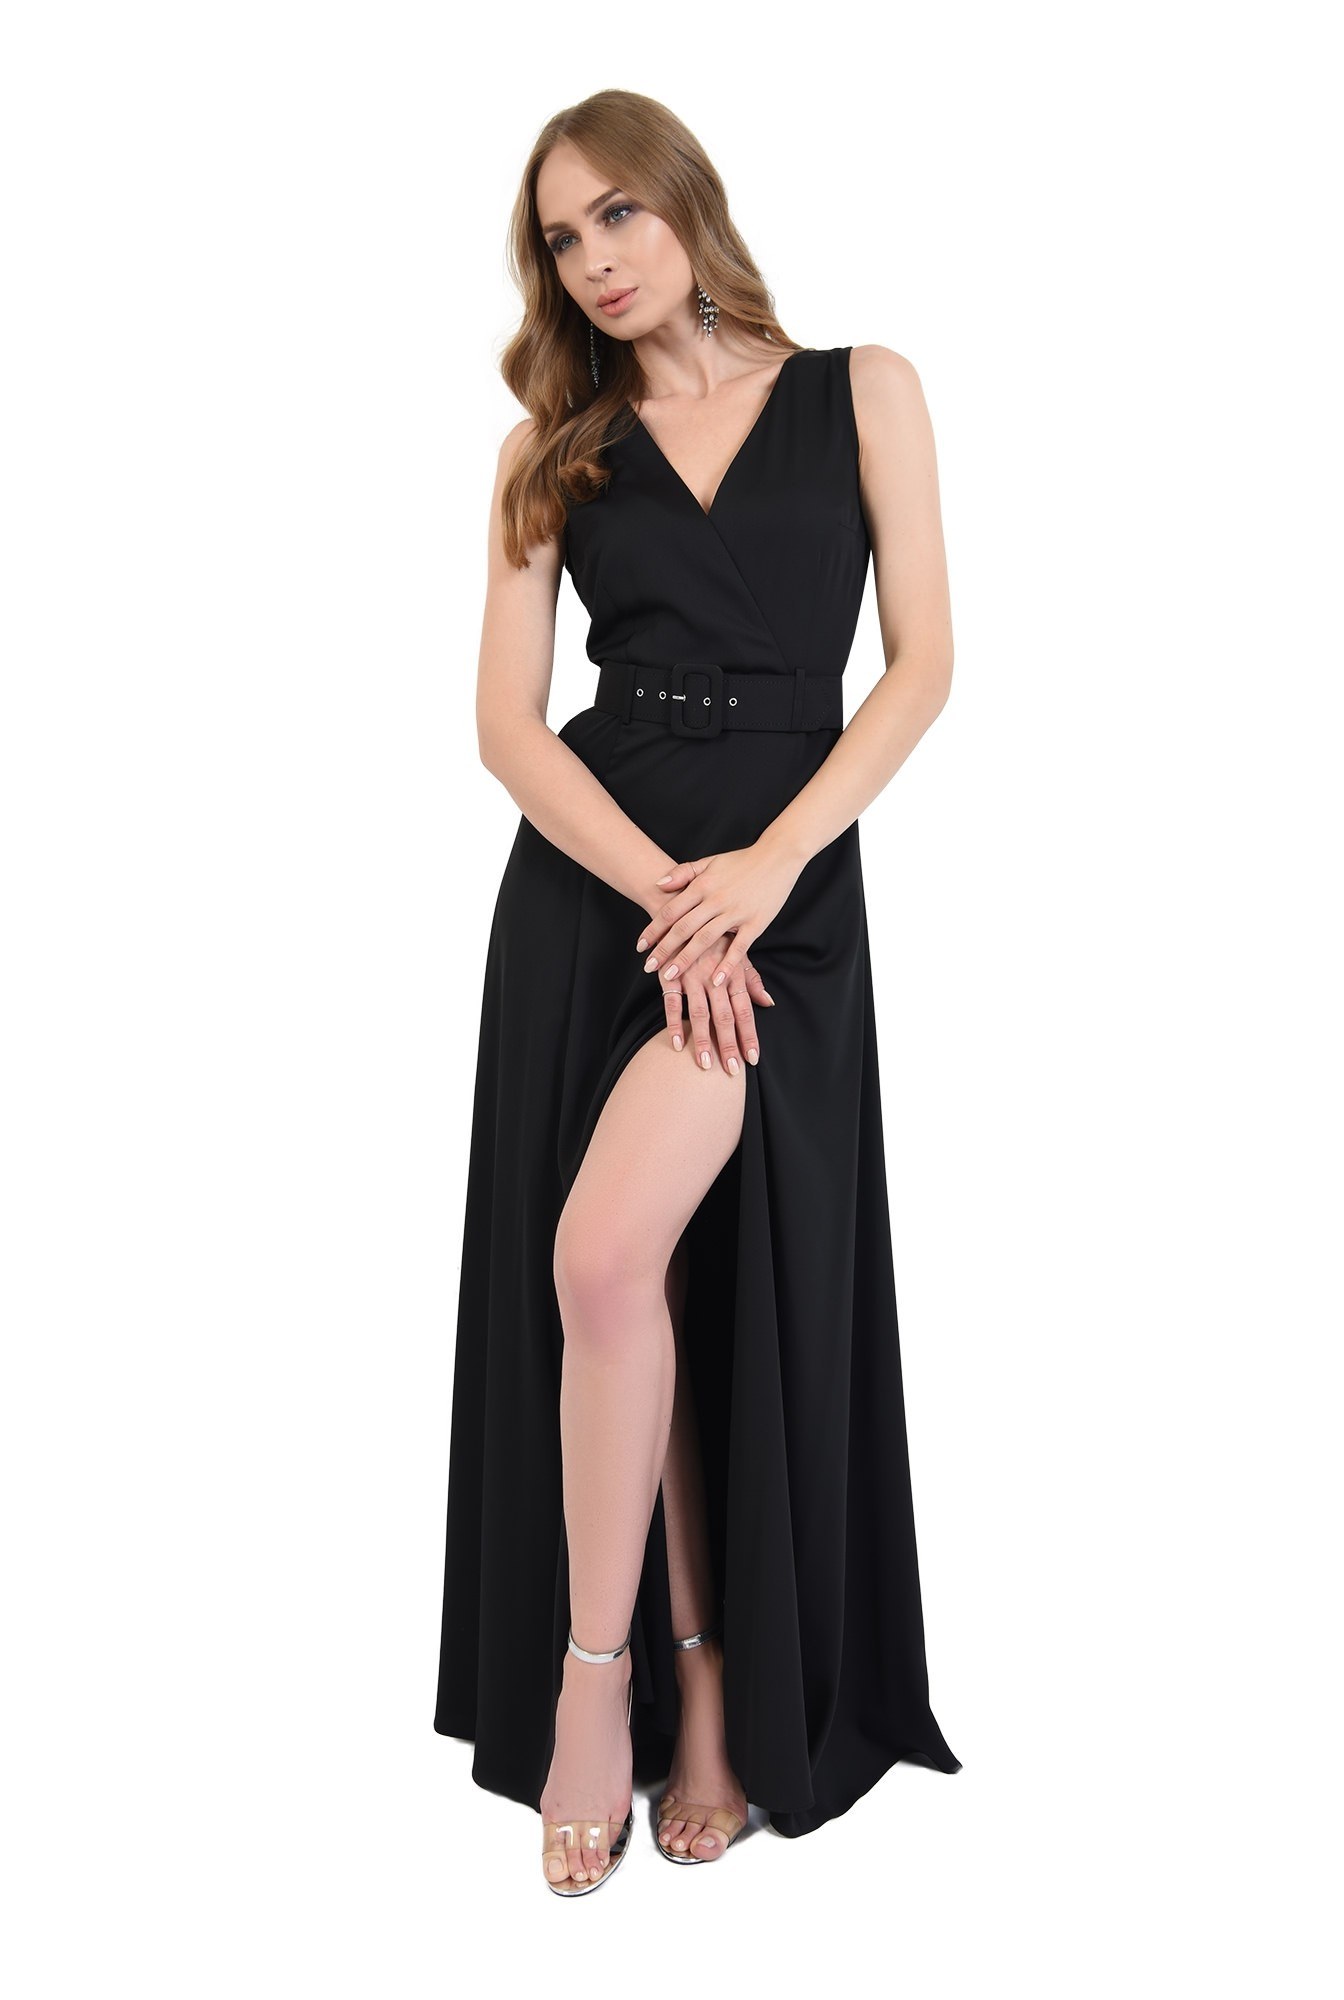 1 - 360 - rochie lunga, neagra, cu centura, Poema